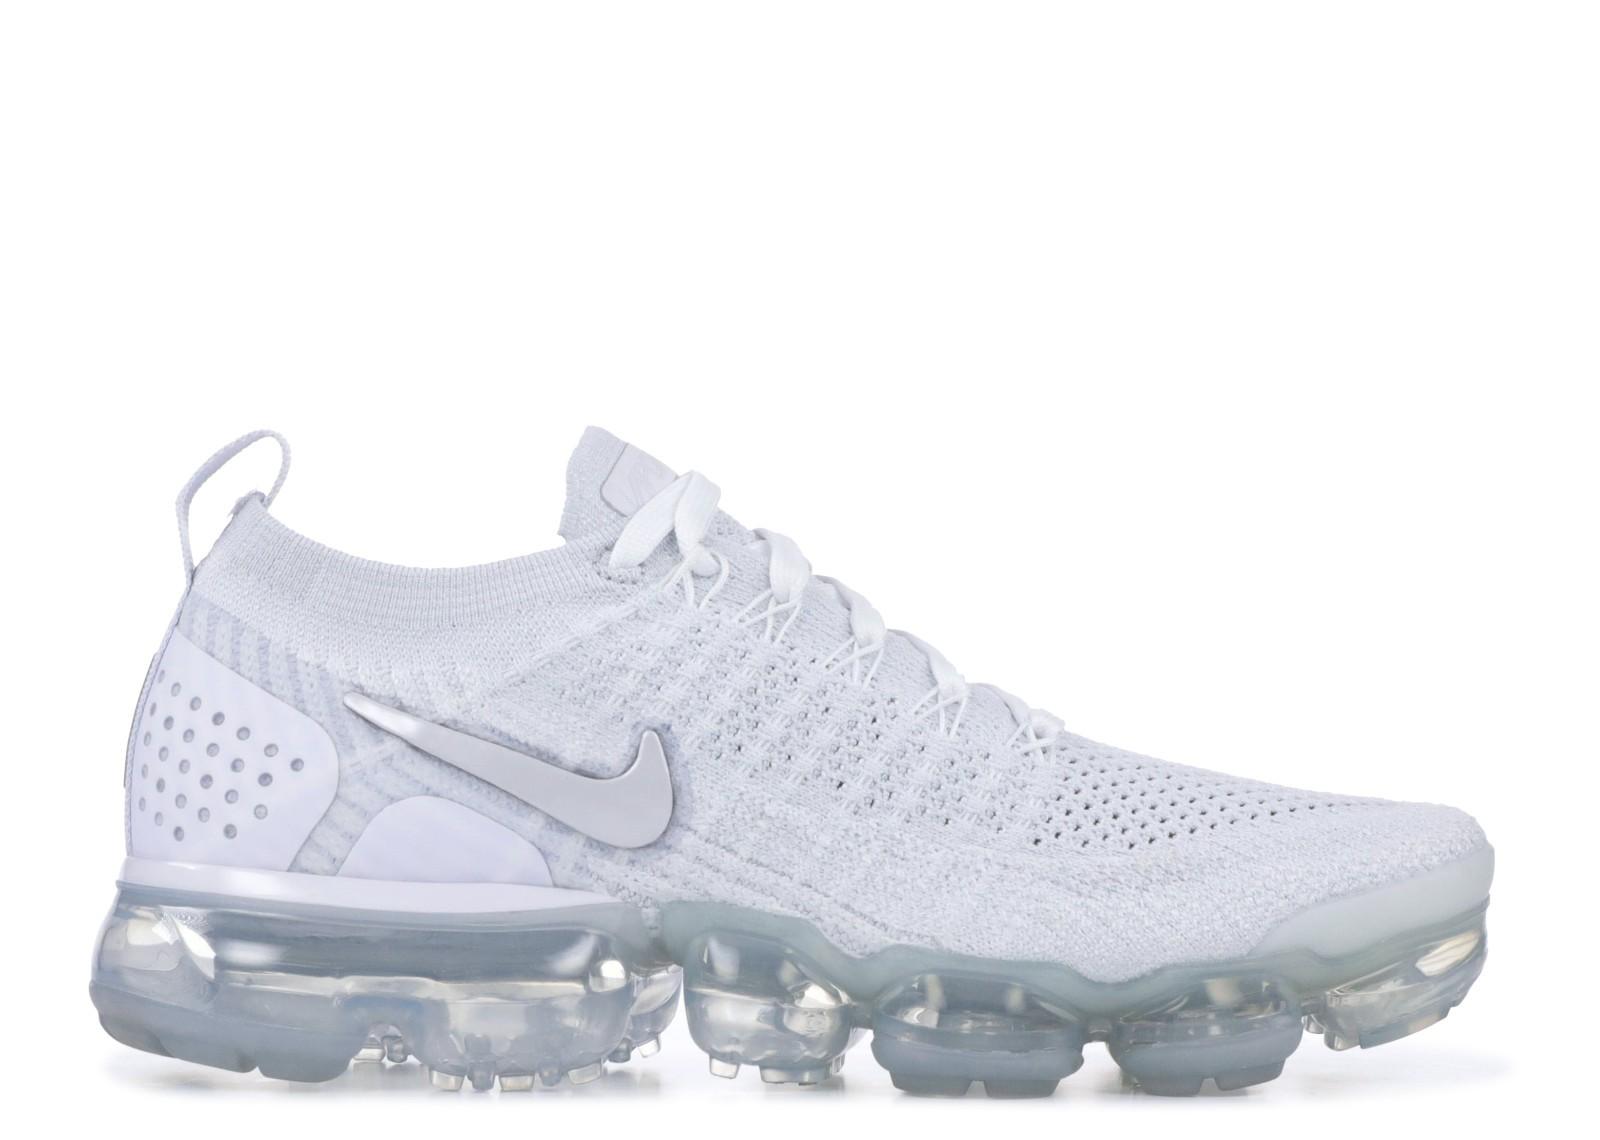 f40e99e215 W Nike Air Vapormax Flyknit 2.0 White Grey Vast 942843-105 - Febbuy